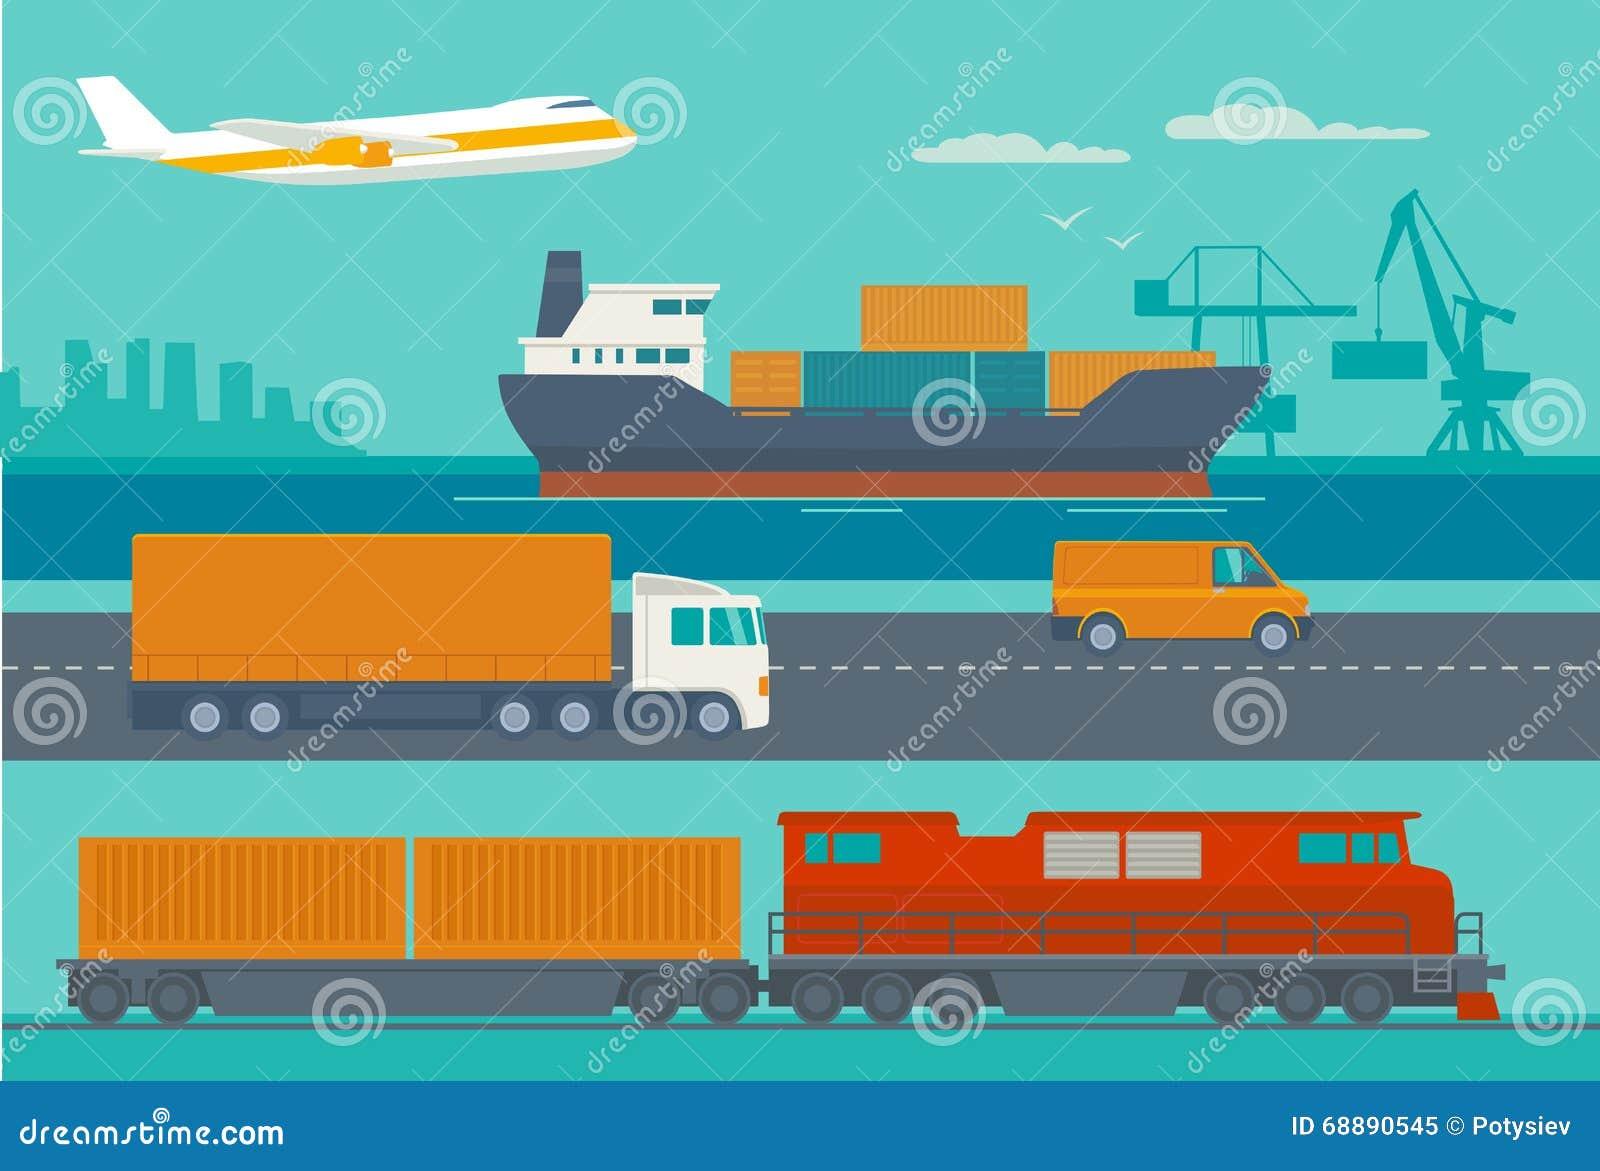 Business plan transport maritime guadeloupe